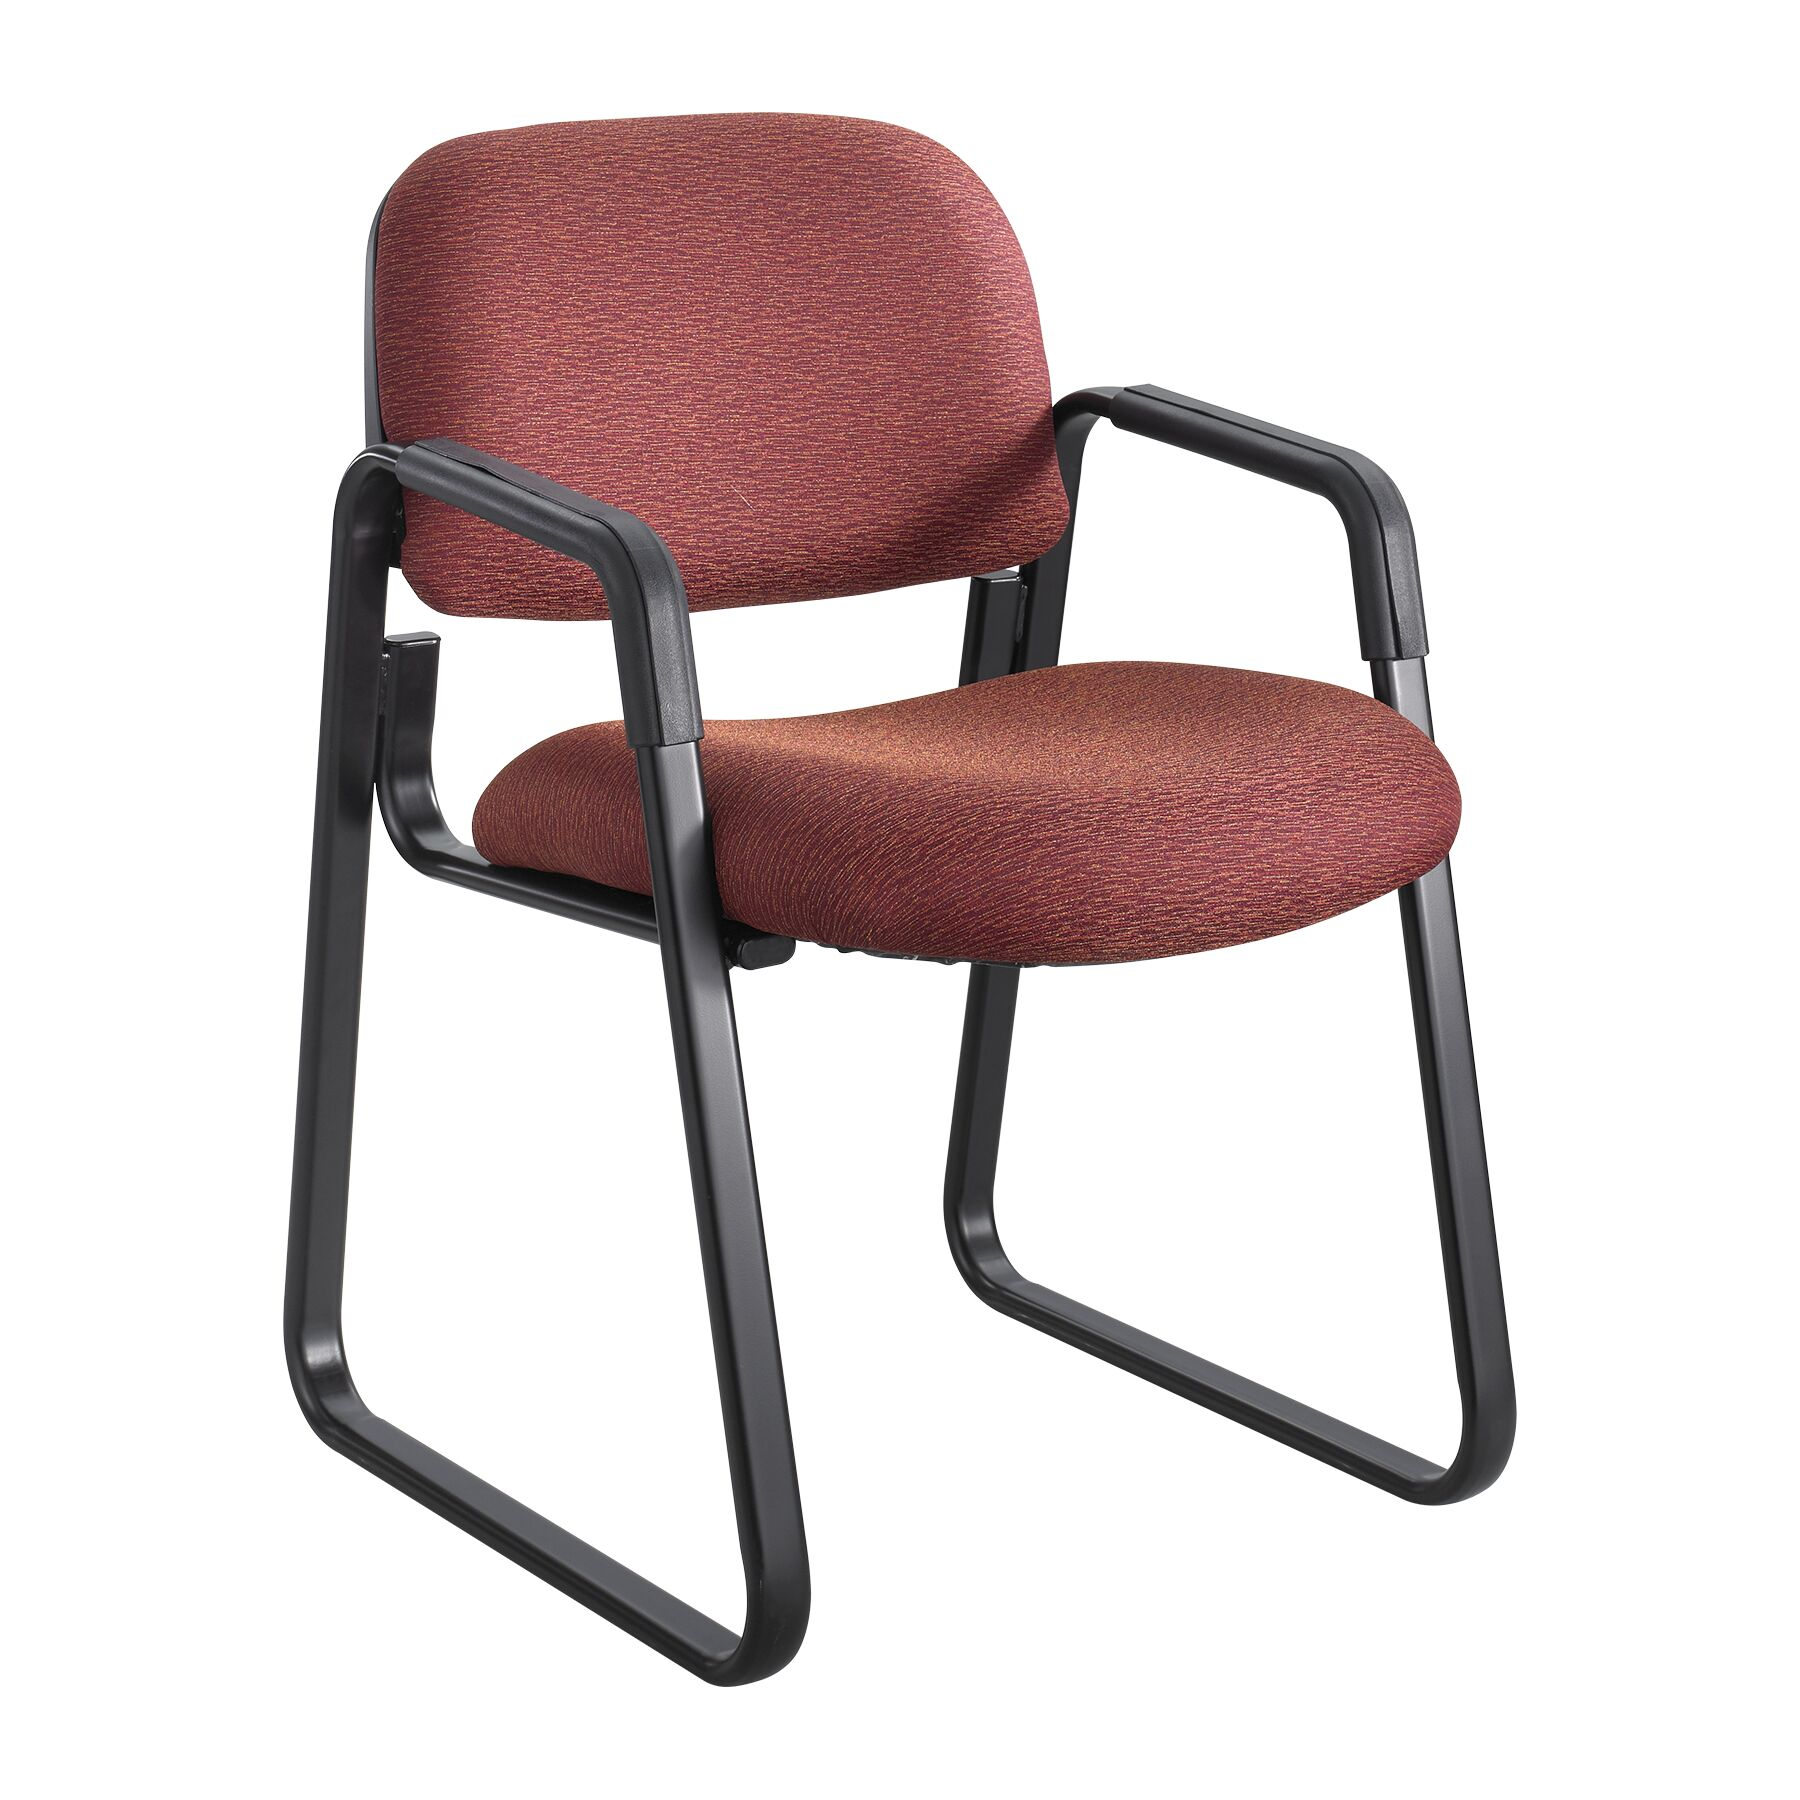 Cava Urth Guest Chair Color: Brown Vinyl, Frame Type: Straight Leg